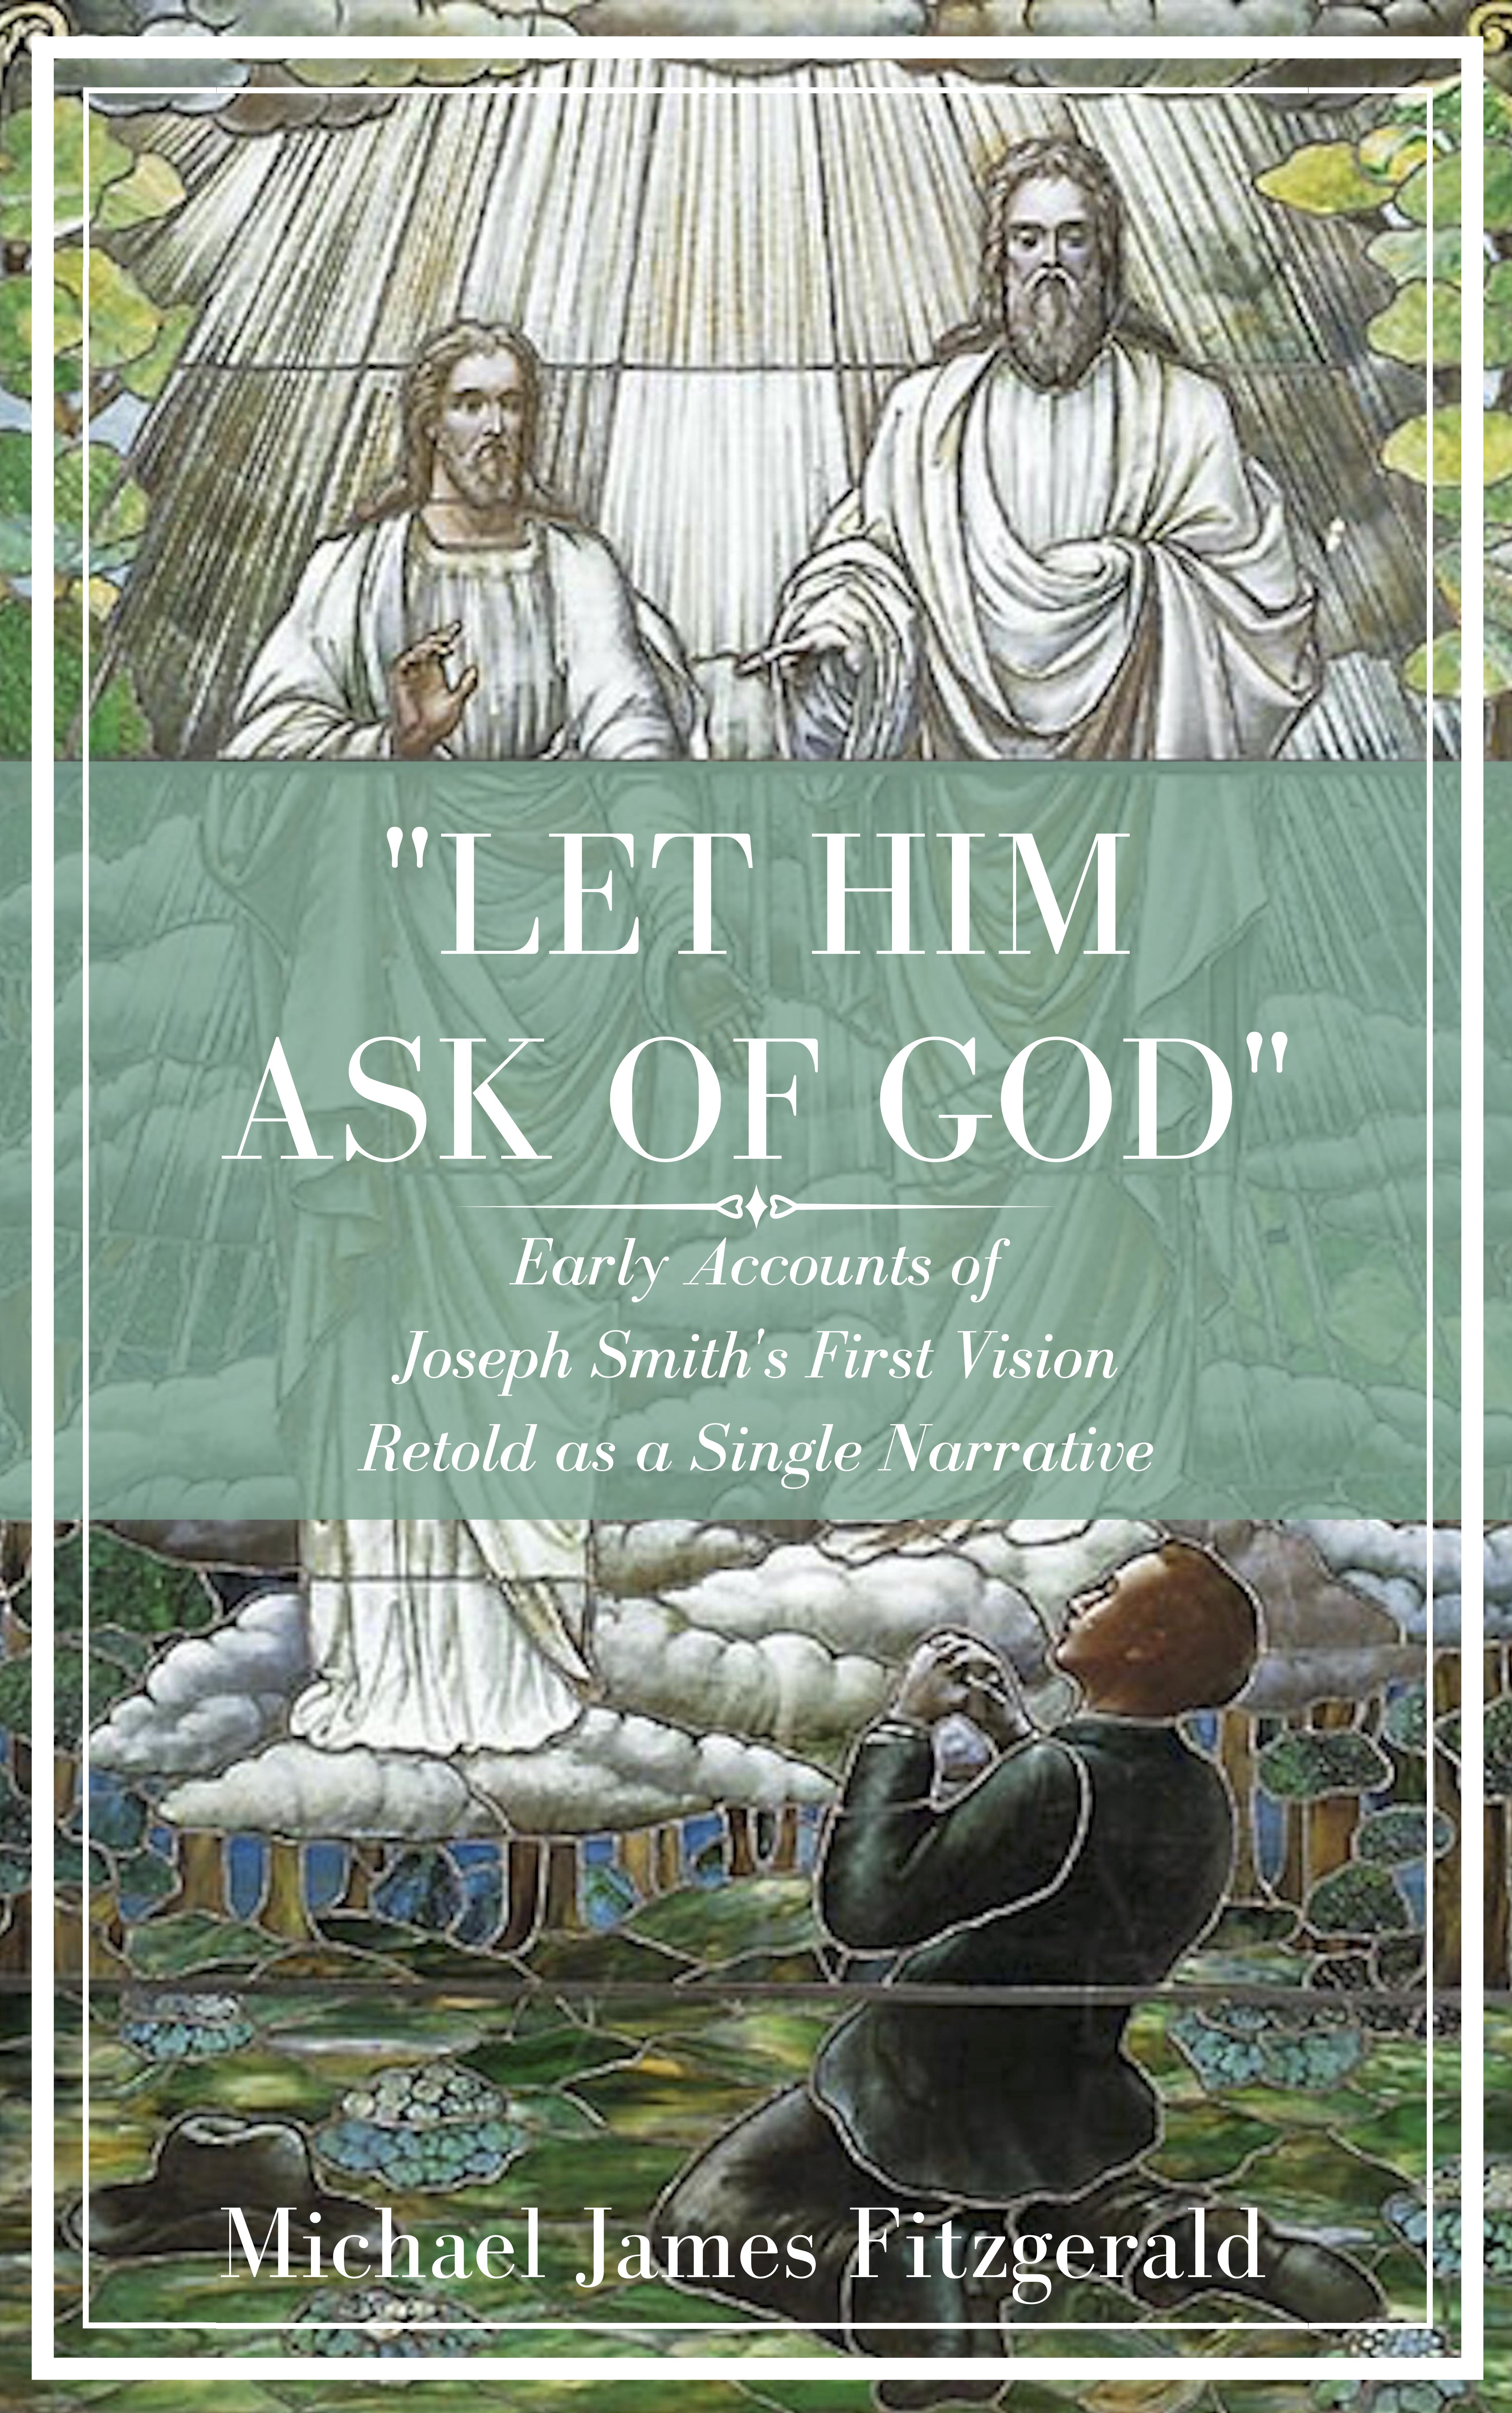 Let Him Ask of God Kindle Cover